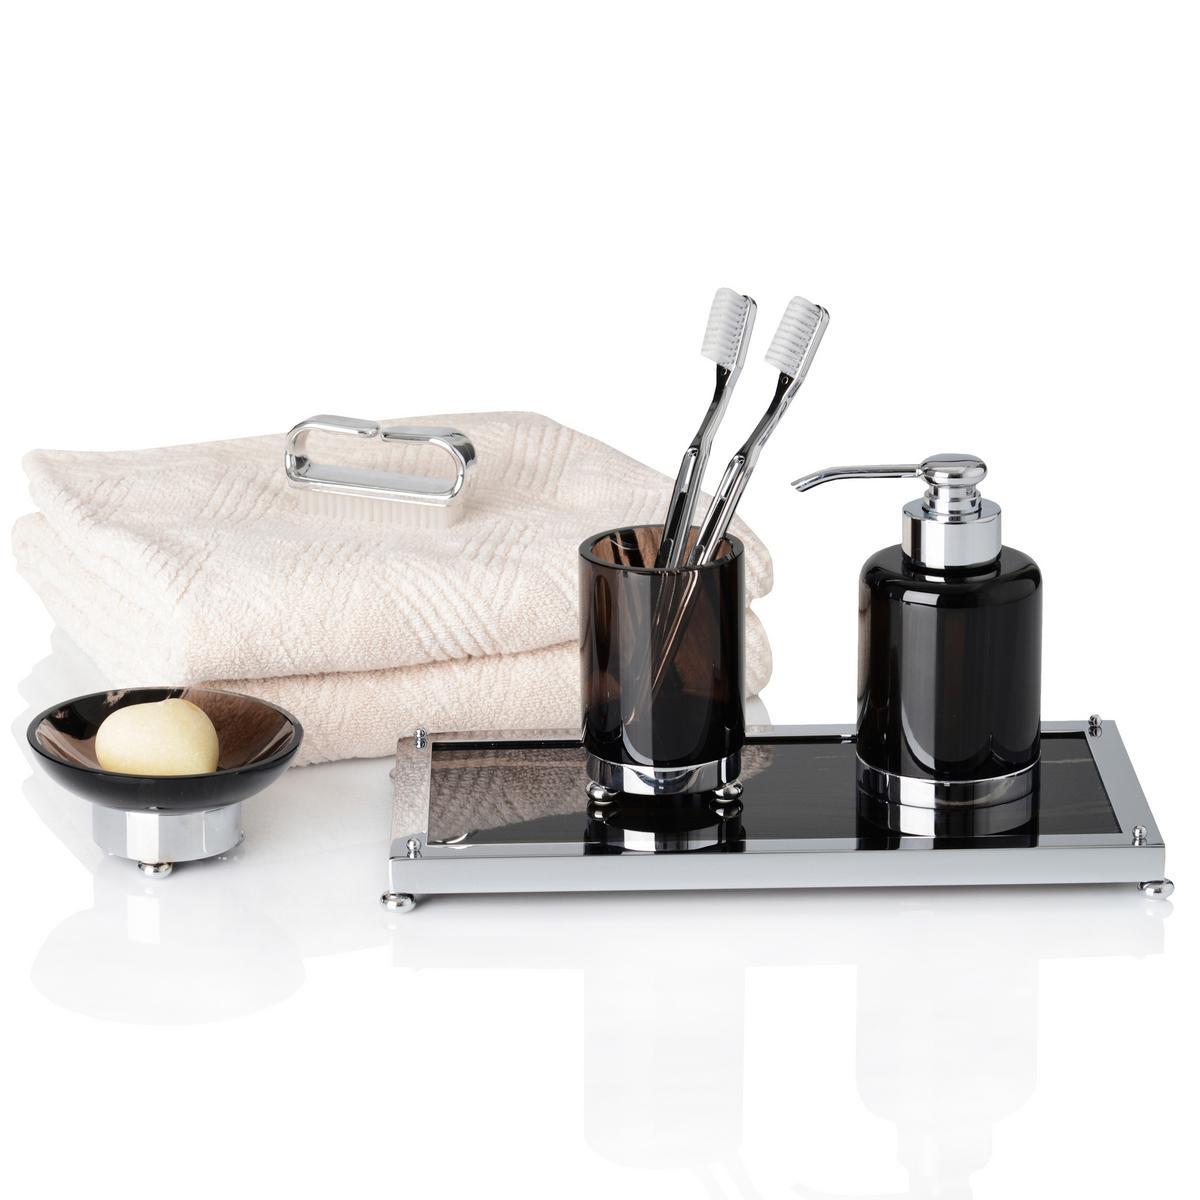 cristal et bronze obsidian bathroom accessories. Black Bedroom Furniture Sets. Home Design Ideas